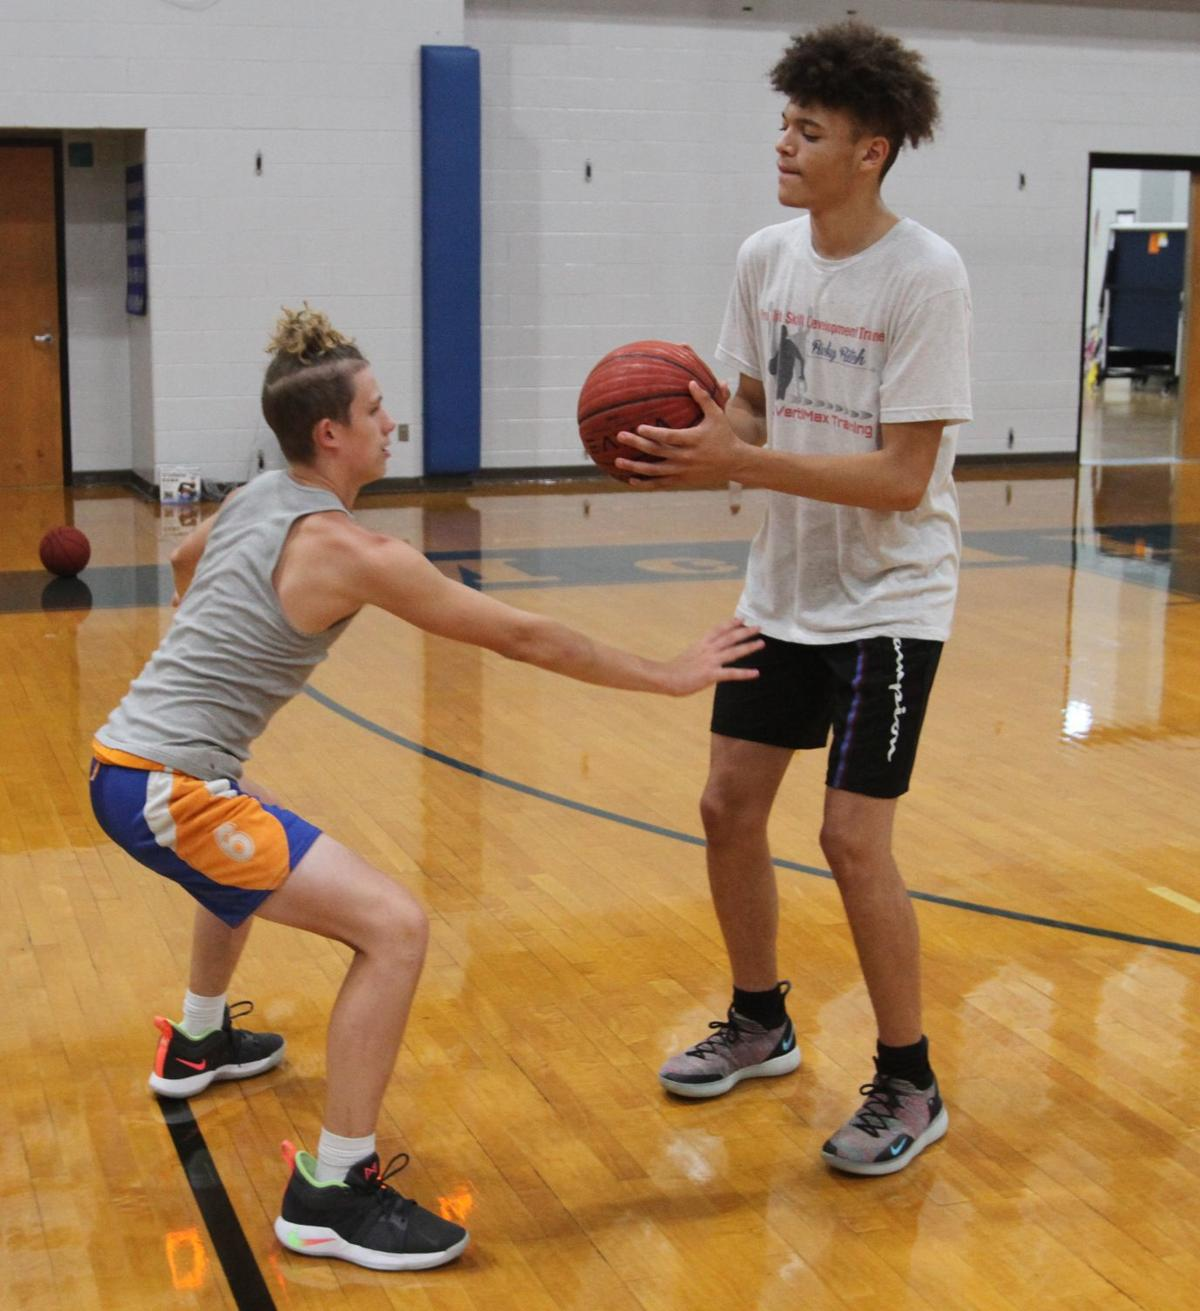 mcmichael_basketball_photo2